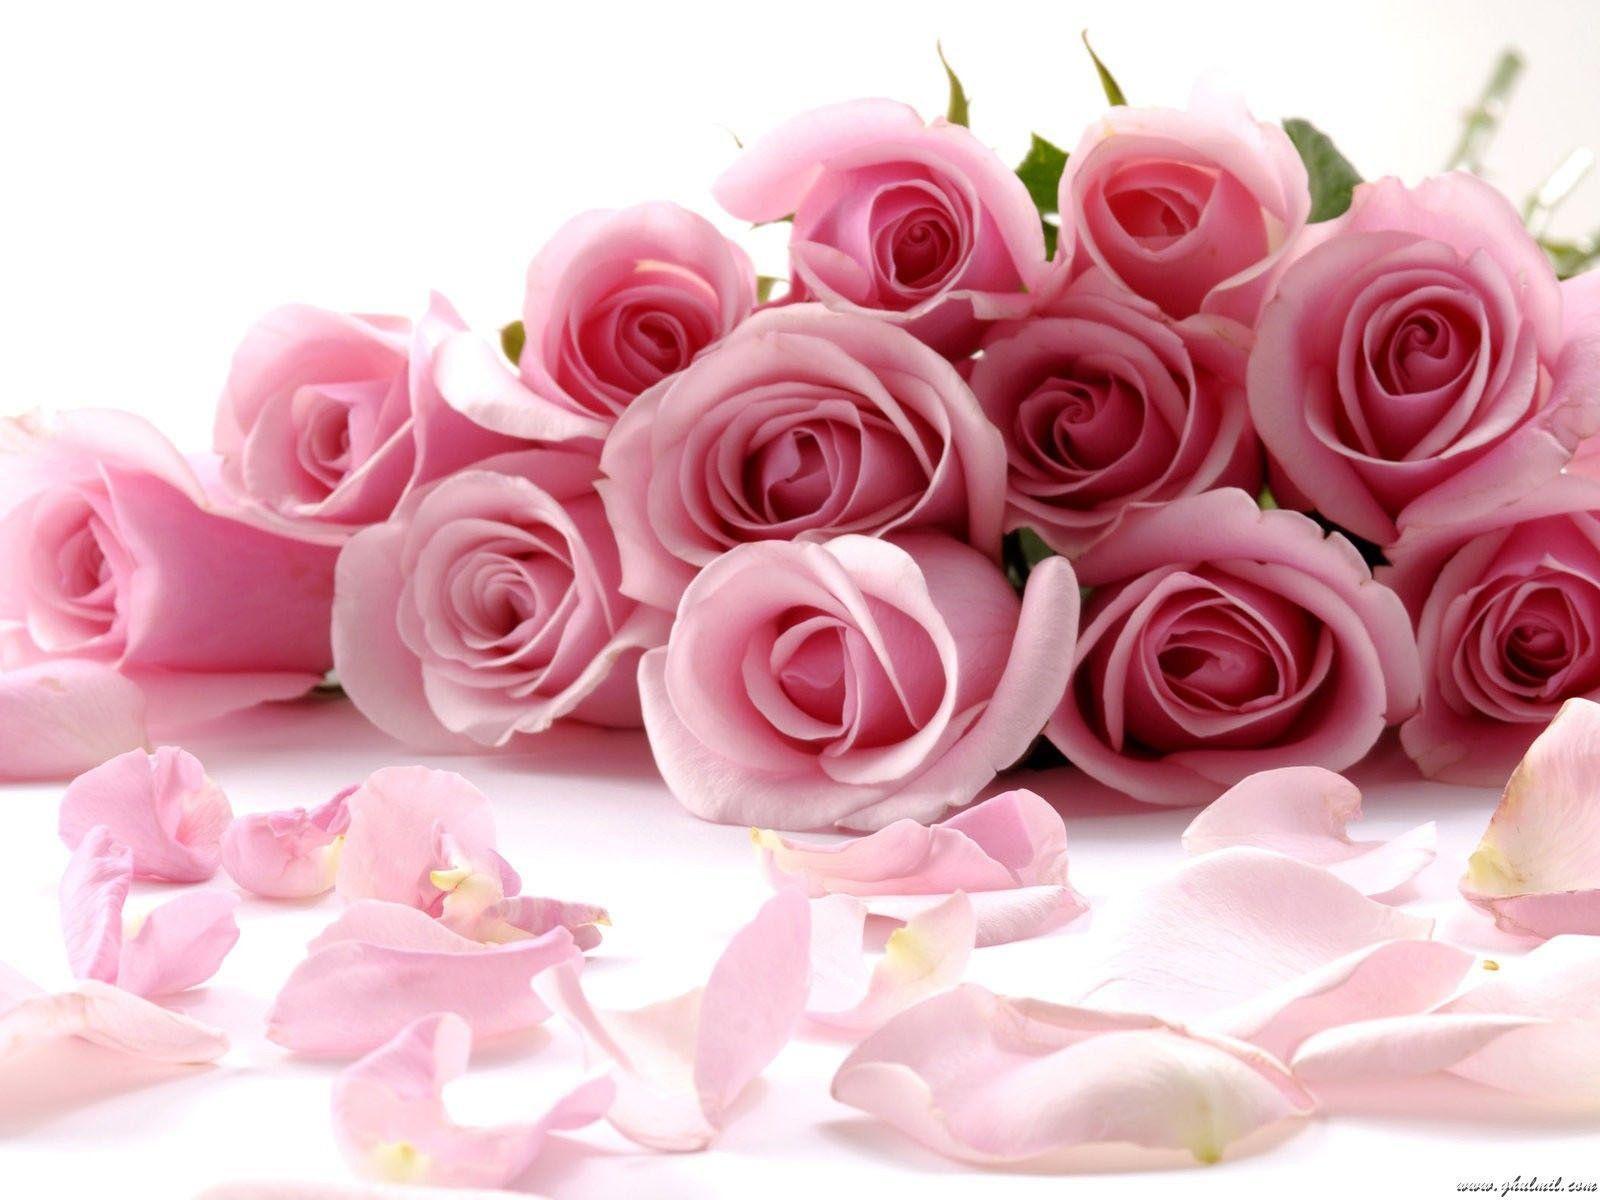 Red rose desktop wallpapers wallpaper cave very beautiful pink red roses wallpaper for desktops free hd izmirmasajfo